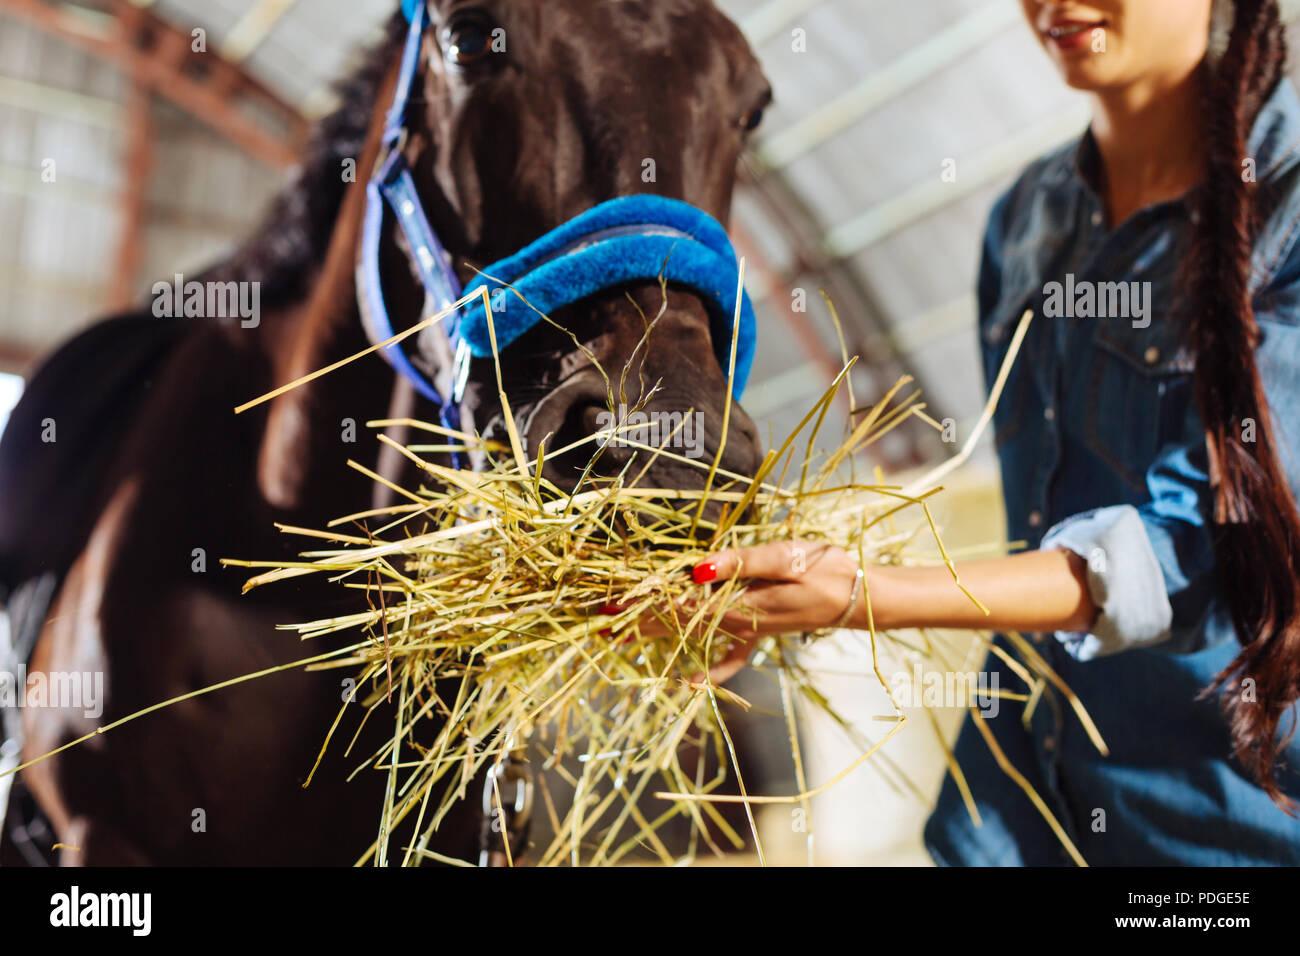 Caring horsewoman feeling lovely while feeding her horse - Stock Image